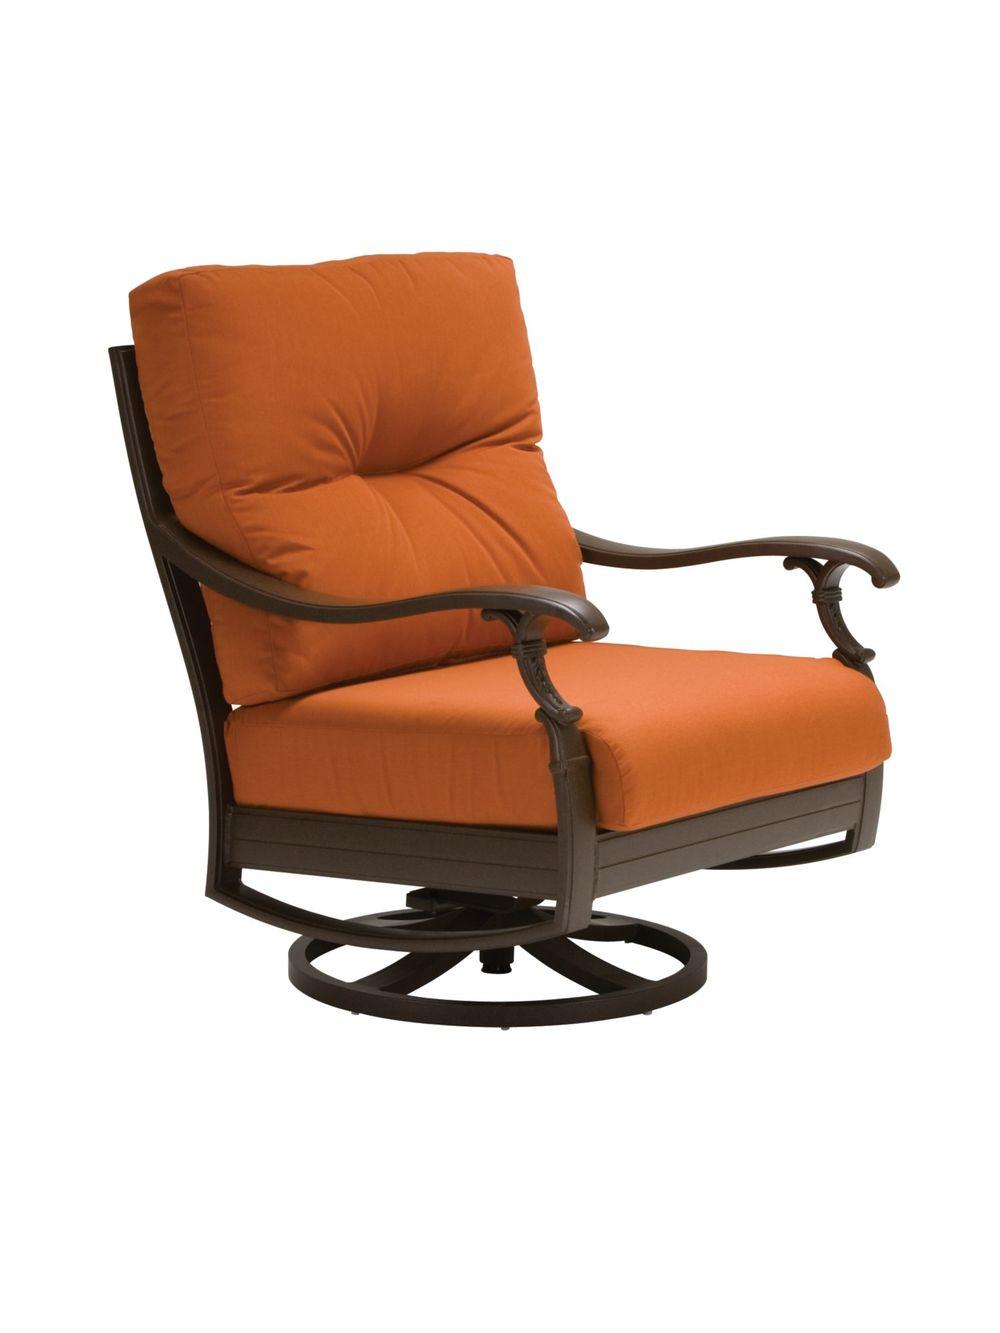 Tropitone Furniture - Swivel Action Lounger